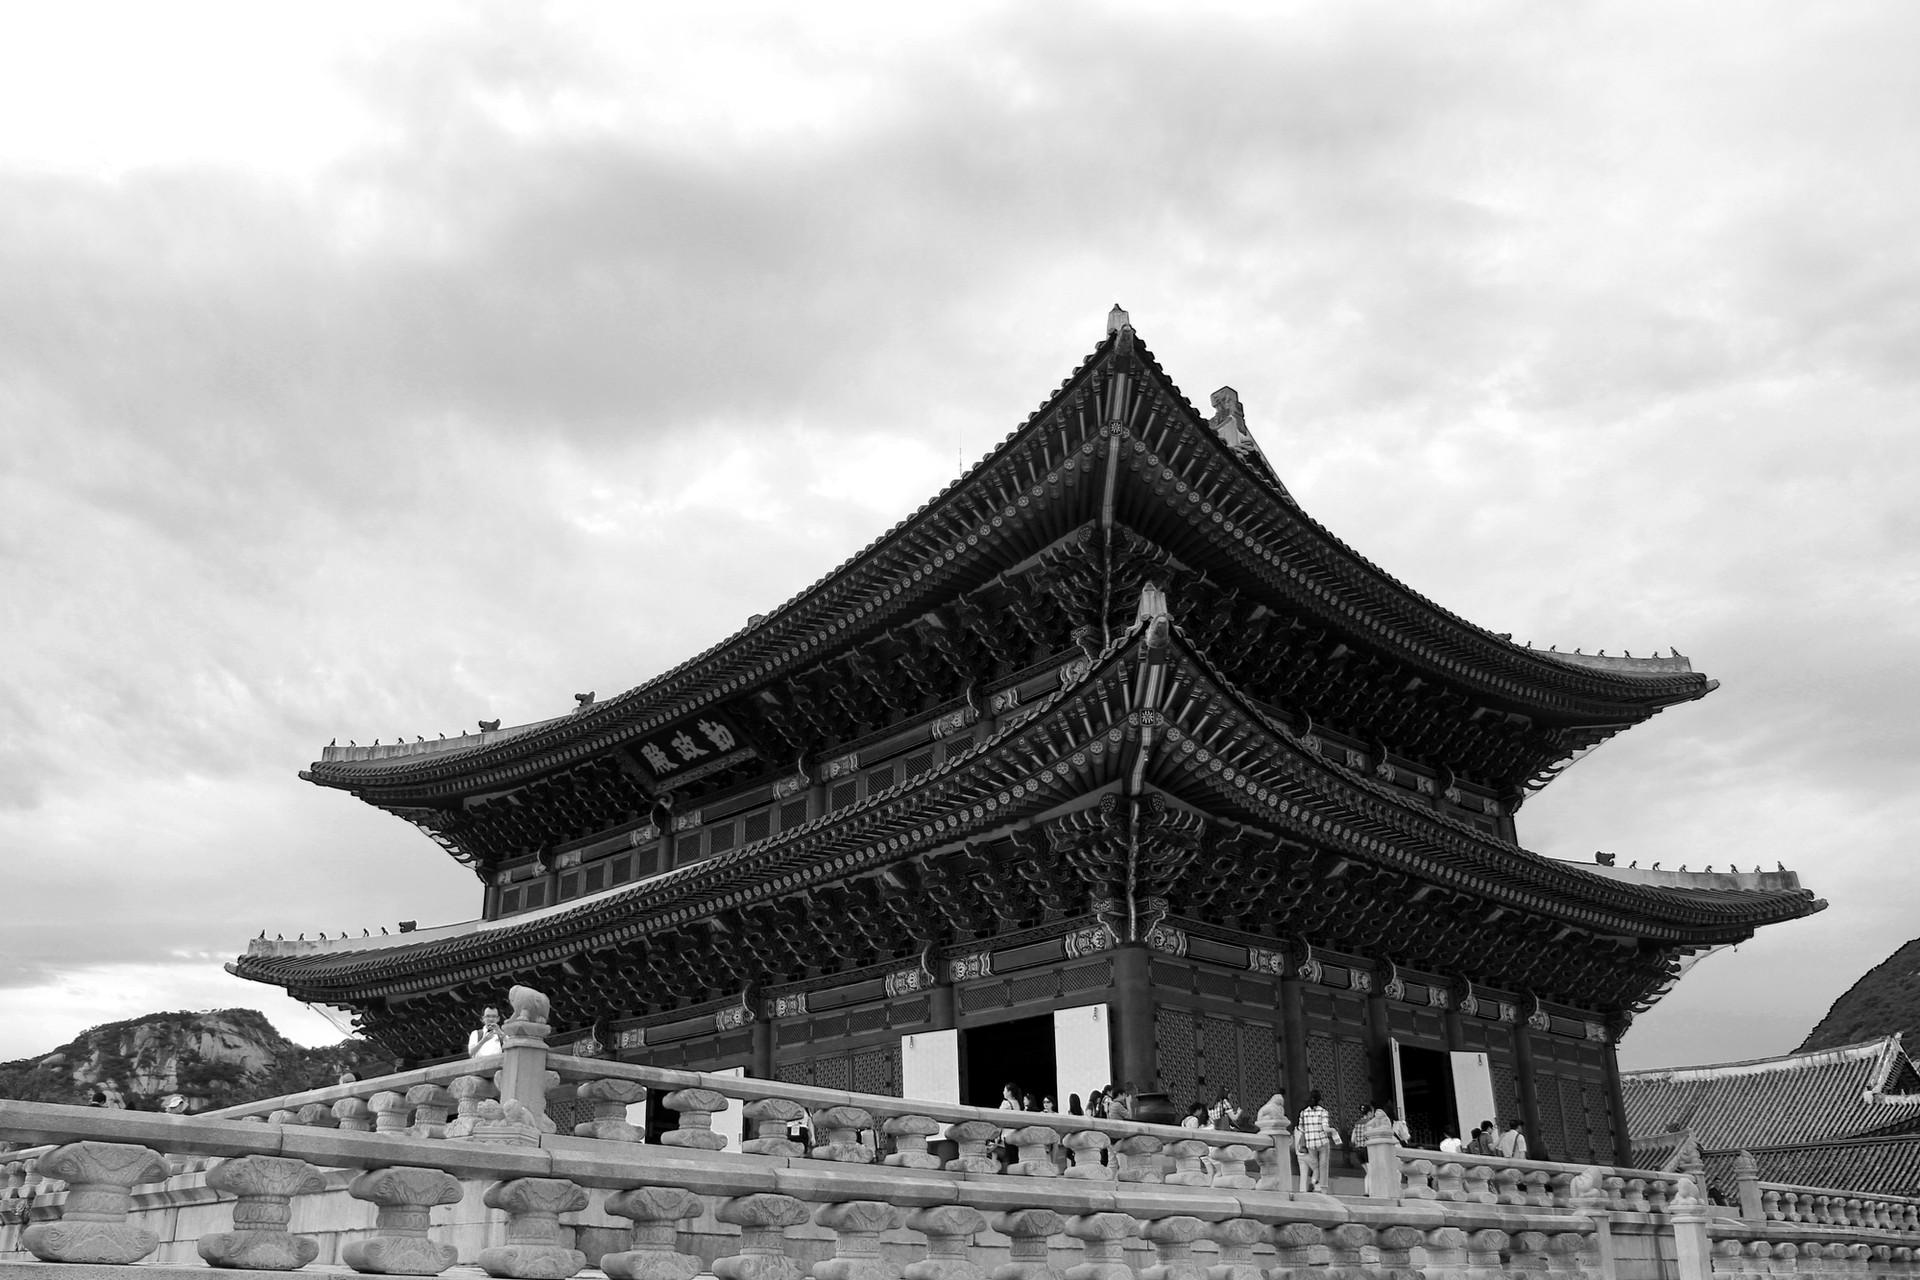 GyeongBokGug, Seoul, South Korea